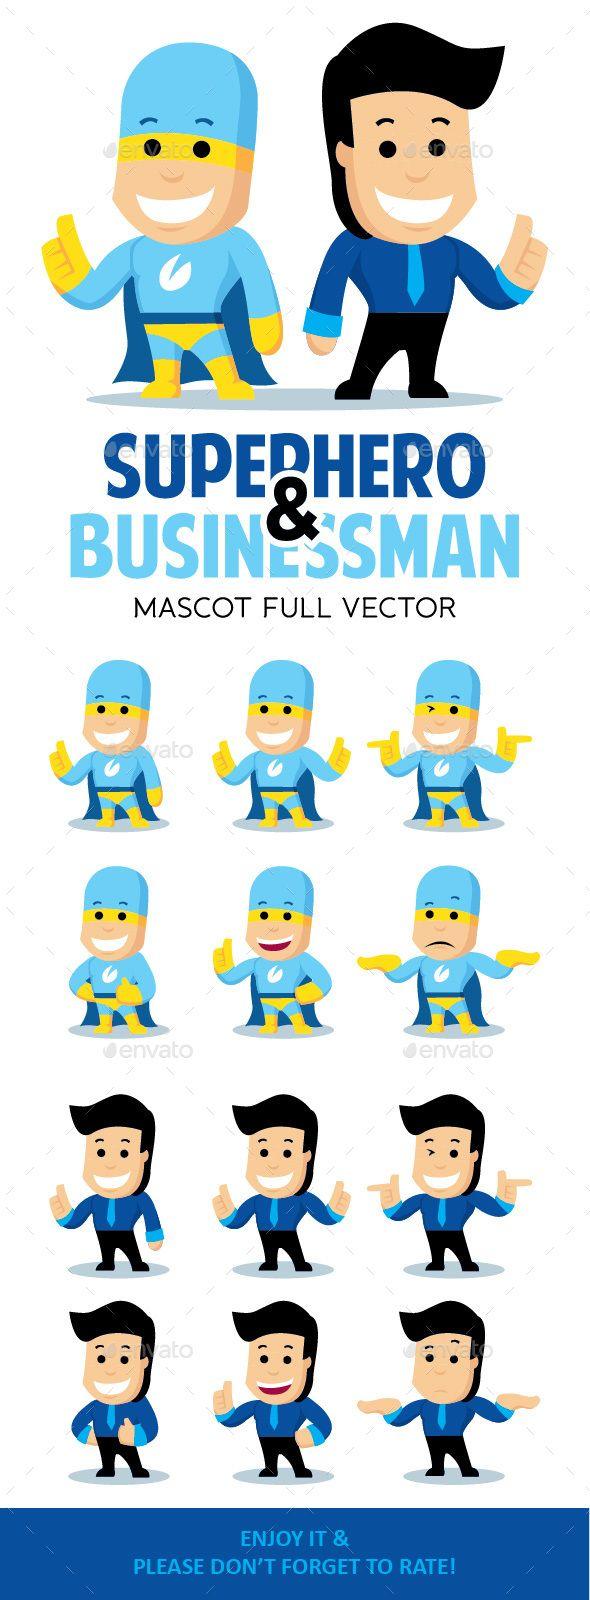 Super Hero and Business Man Mascot